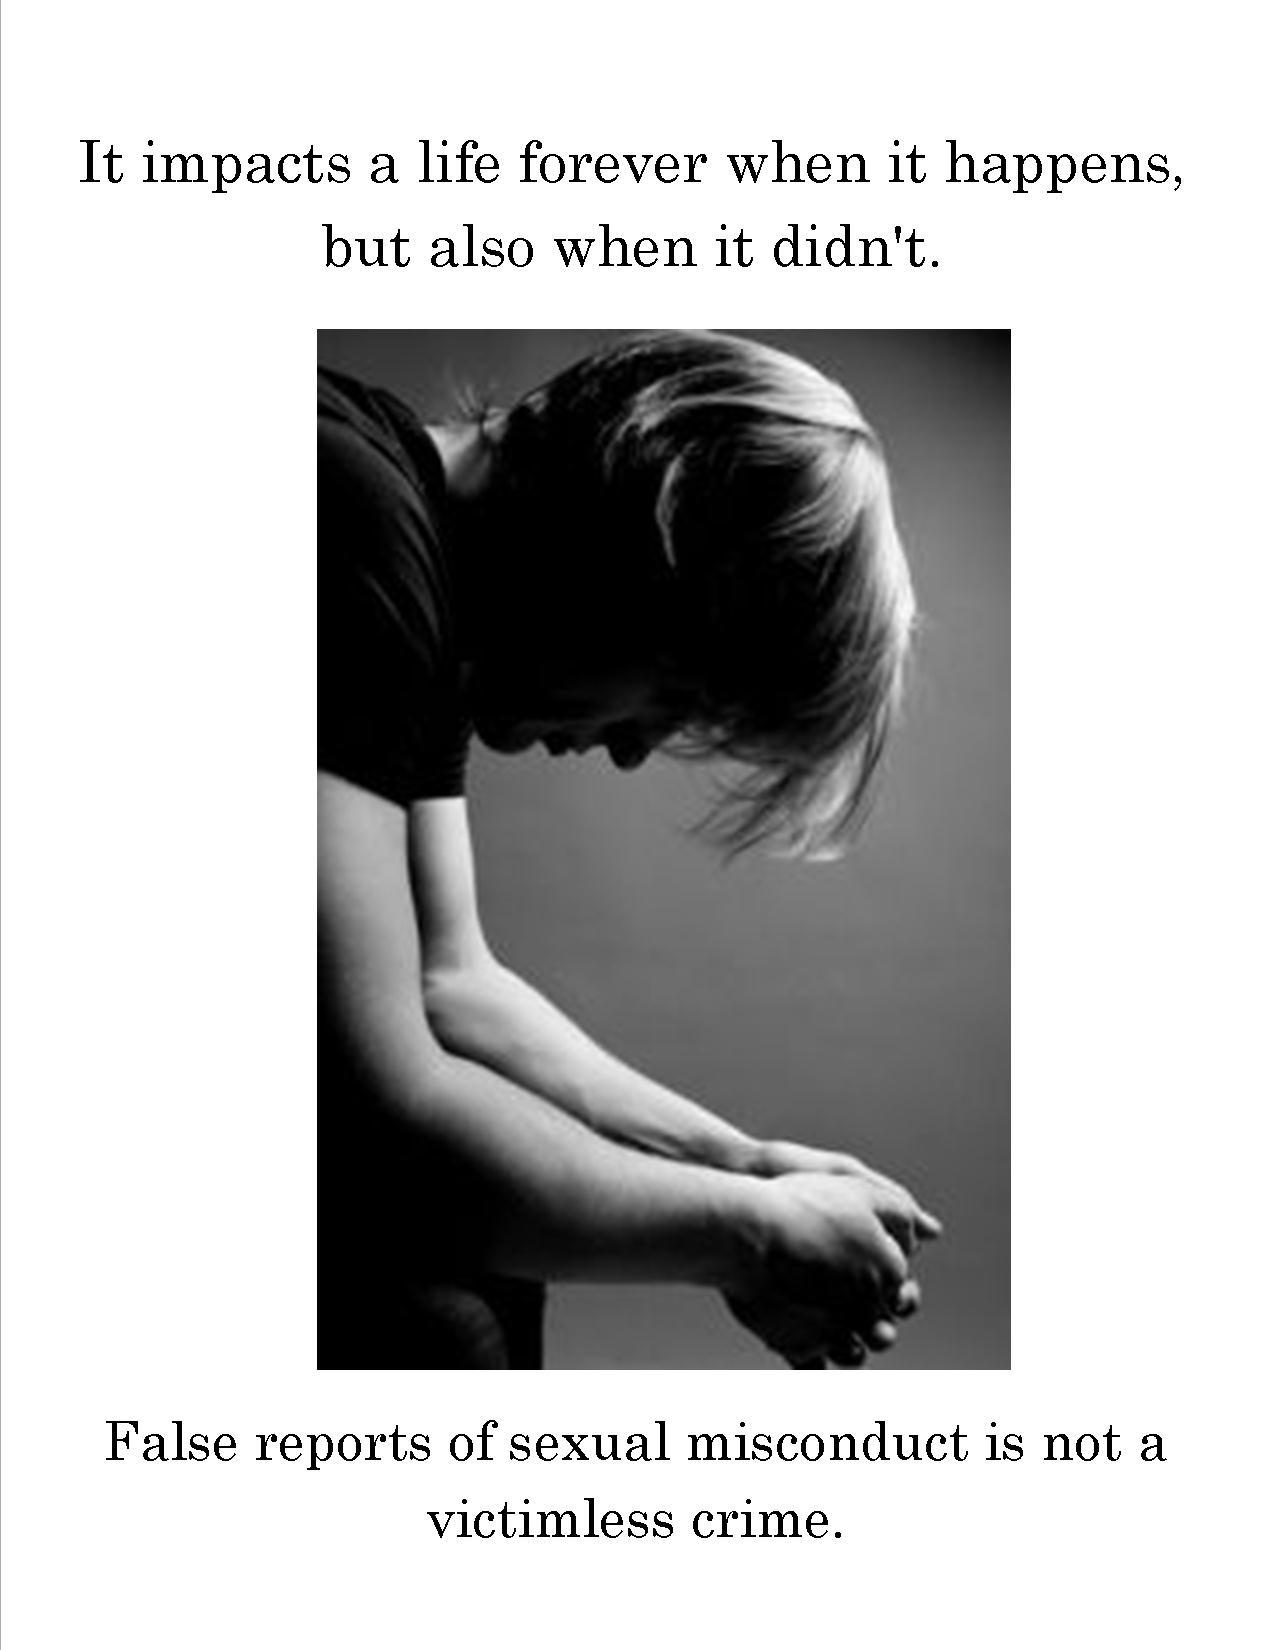 false rape claim